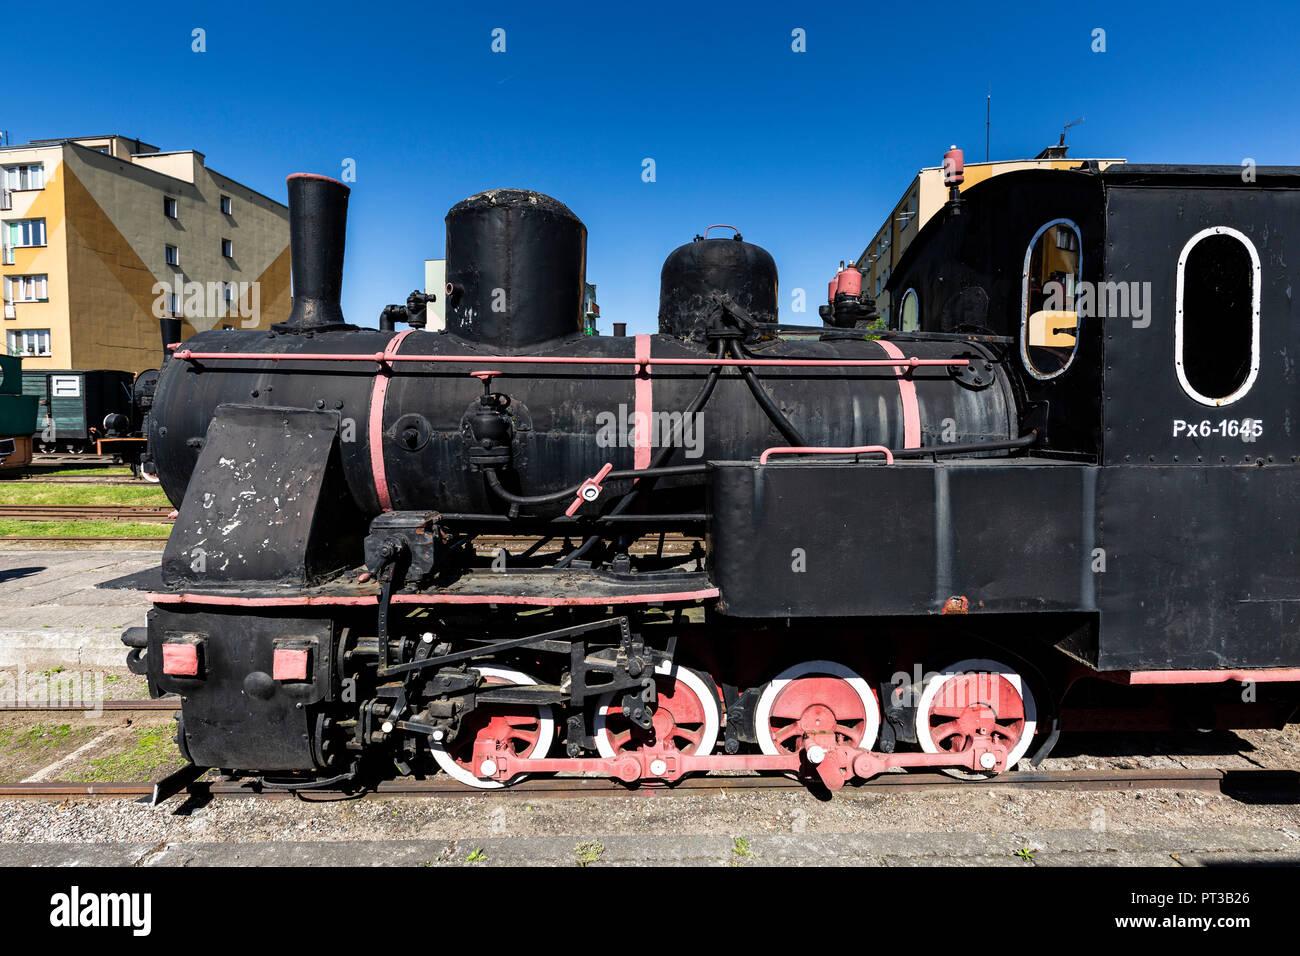 Europe, Poland, Voivodeship Masovian, The Narrow Gauge Railway Museum in Sochaczew - Stock Image